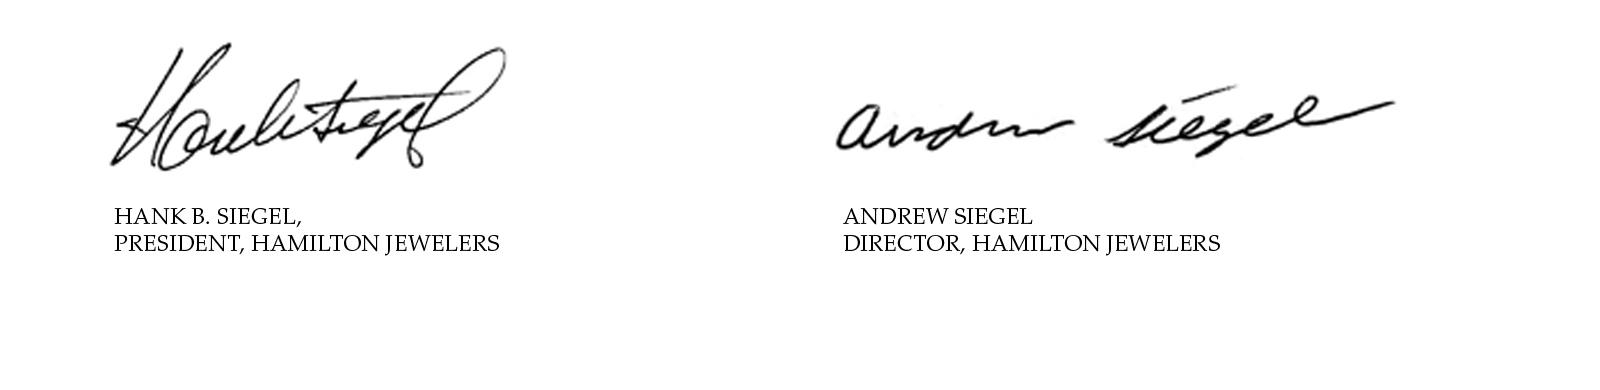 Hank and Andrew Siegel